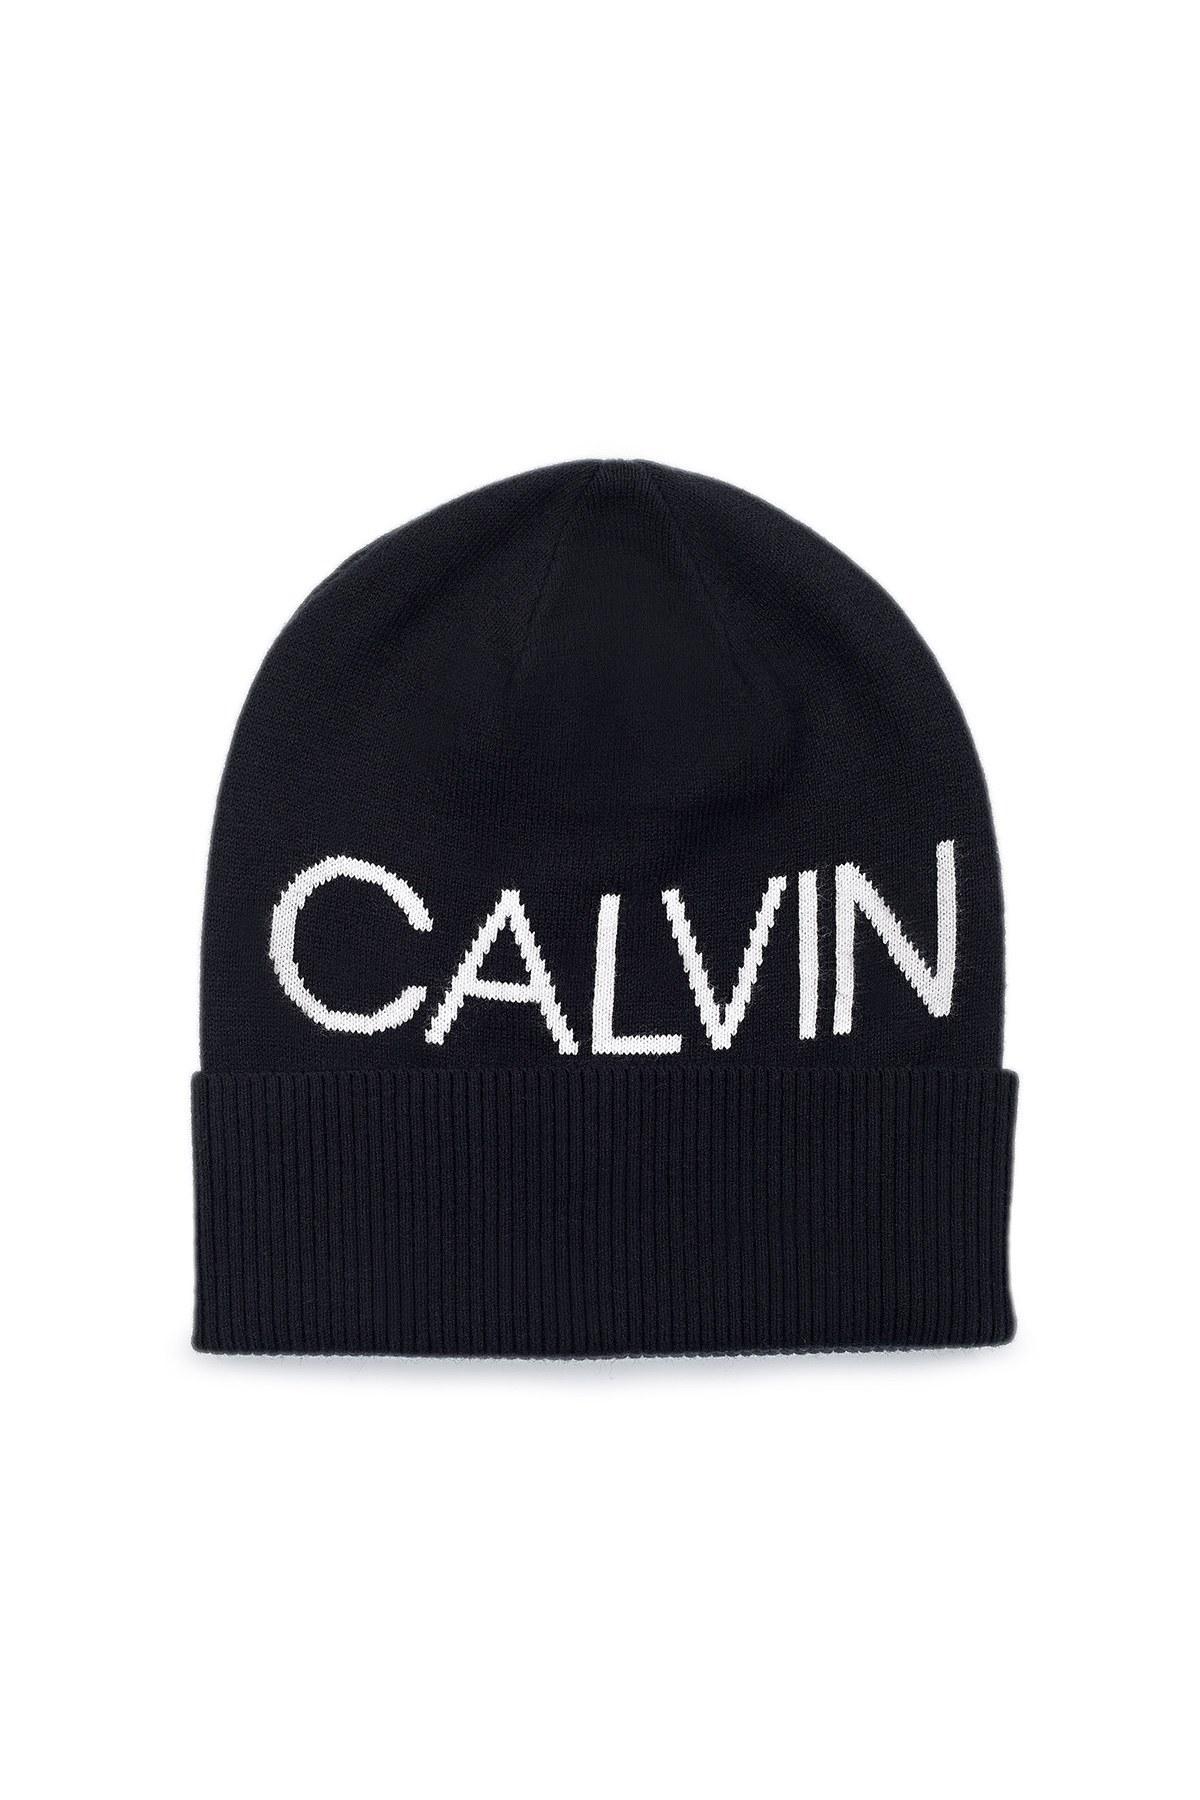 Calvin Klein Logo Baskılı Pamuklu Erkek Bere K50K506226 BDS SİYAH